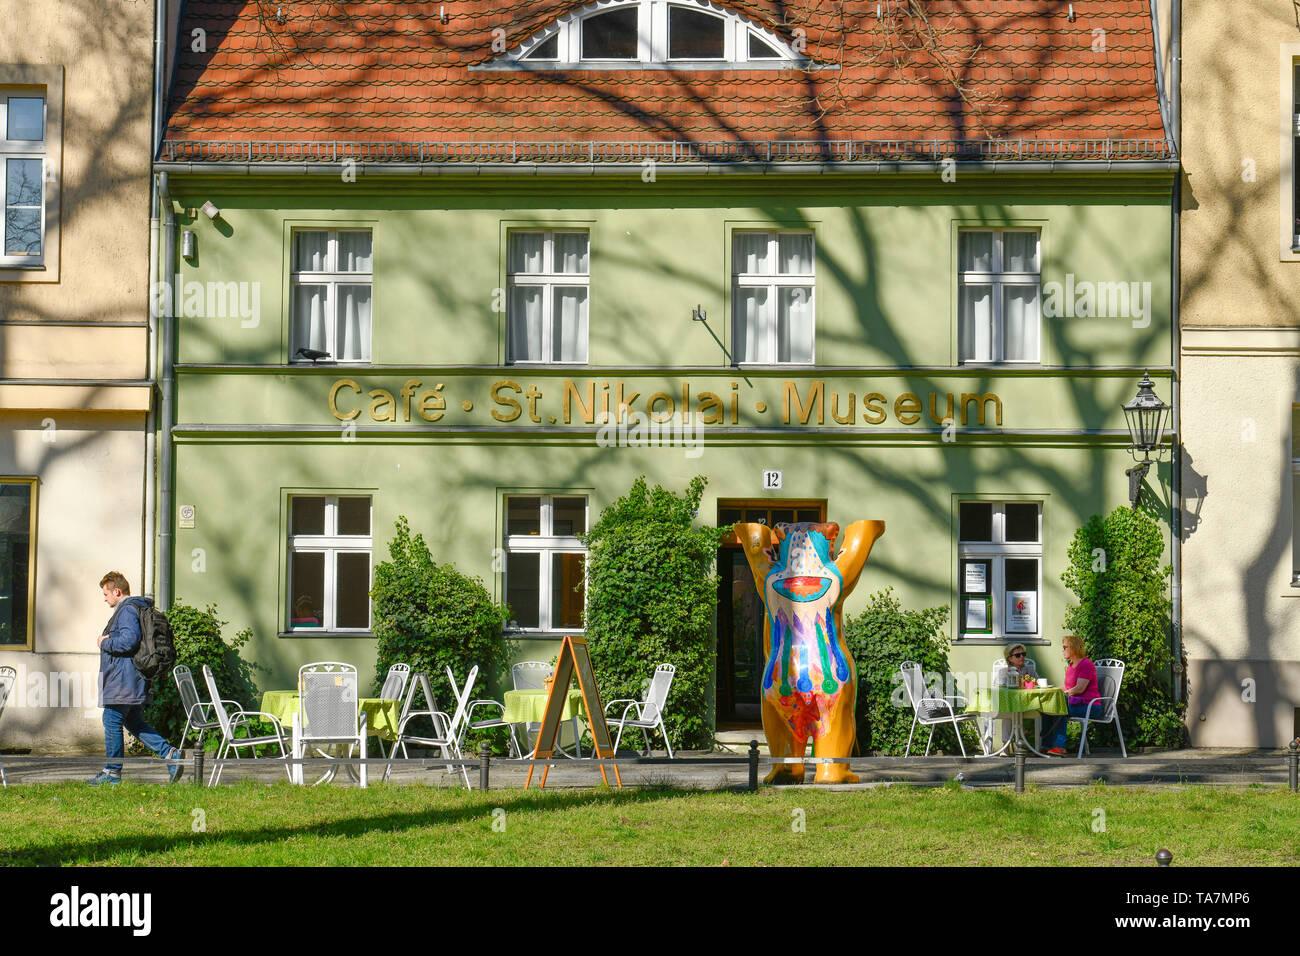 Saint Nikolai museum, Reformation place, Old Town, Spandau, Berlin, Germany, St. Nikolai Museum, Reformationsplatz, Altstadt, Deutschland - Stock Image